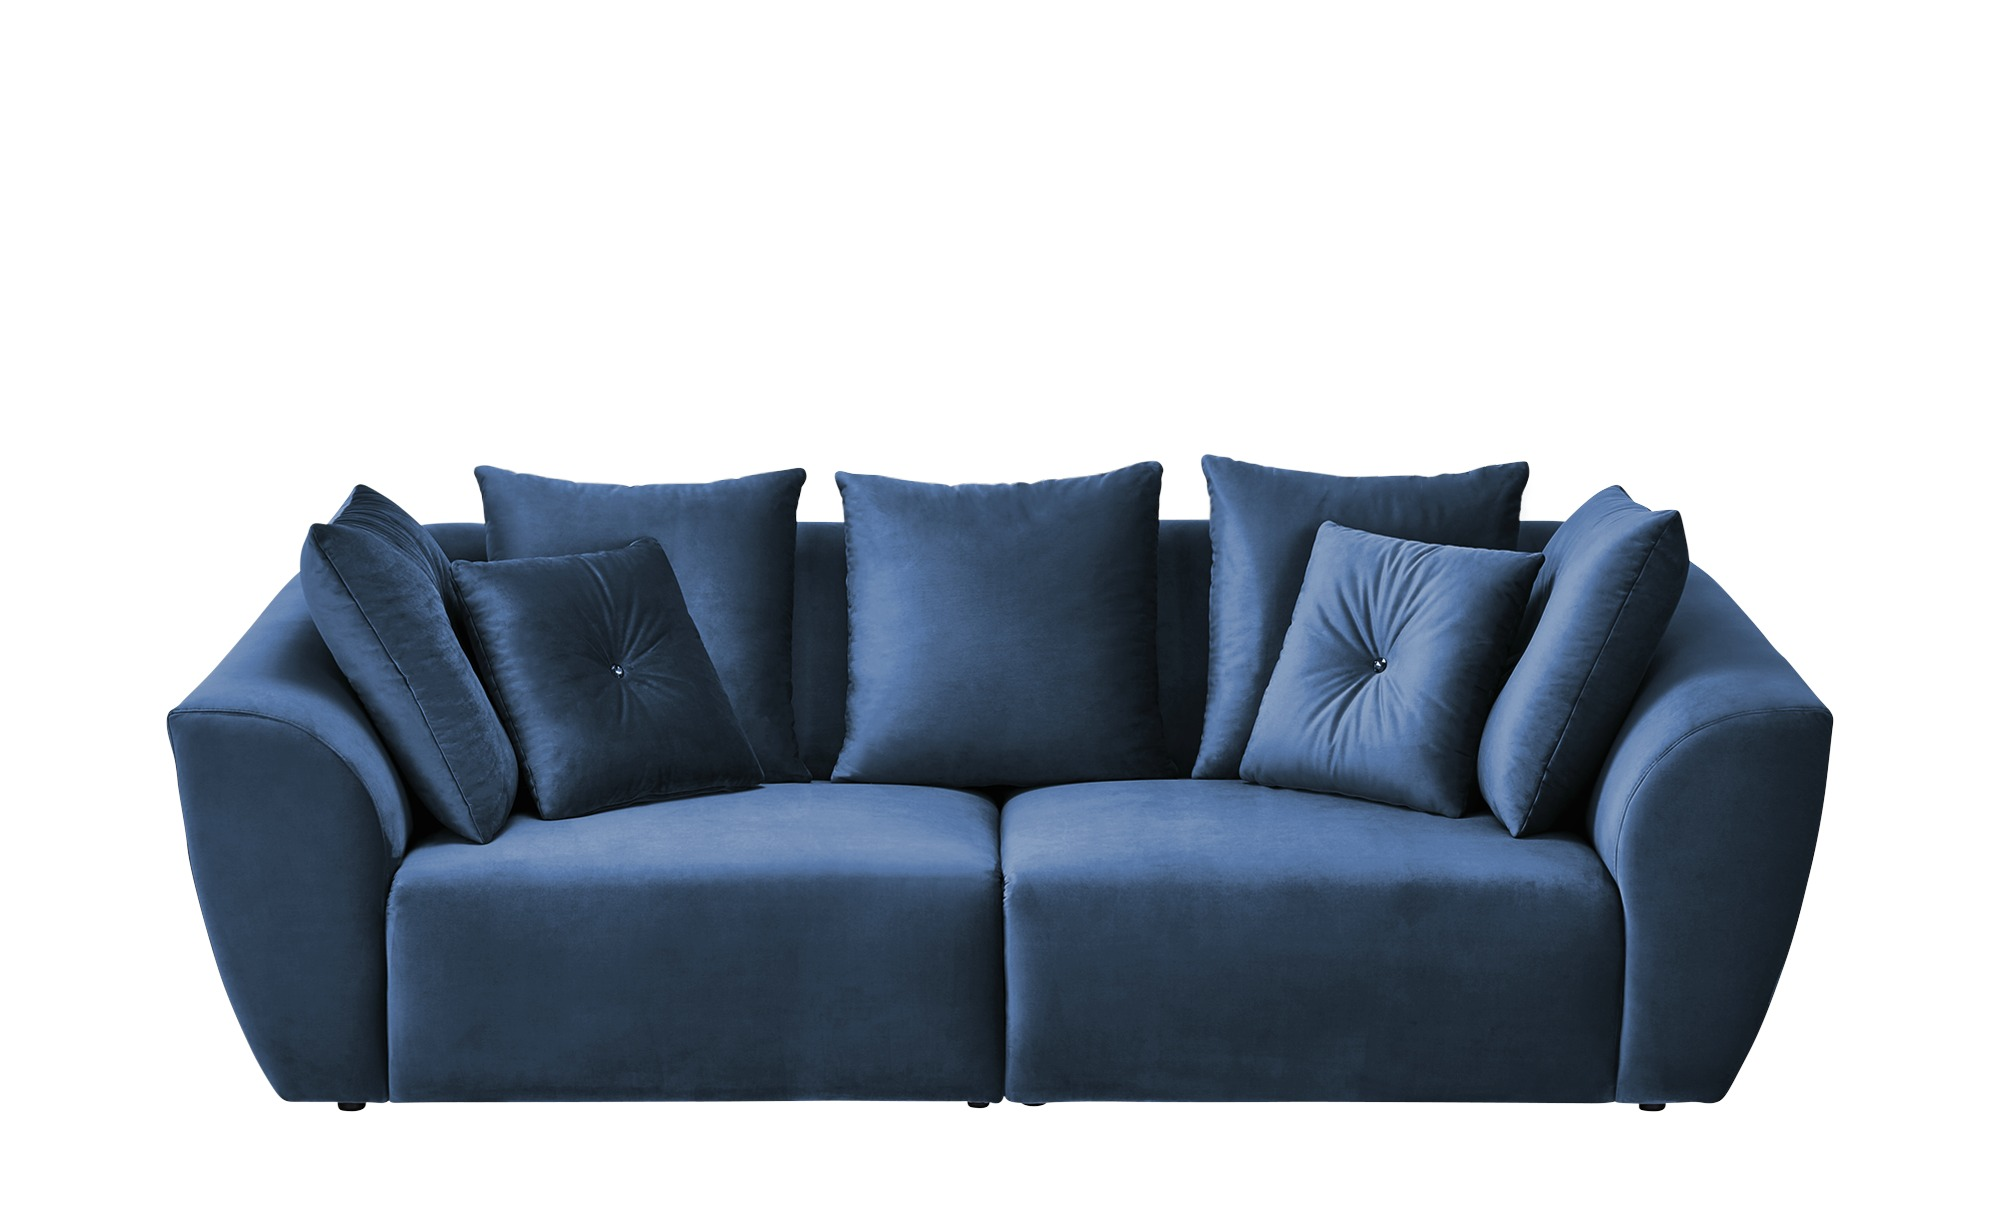 smart Big Sofa  Krista ¦ blau ¦ Maße (cm): B: 255 H: 85 T: 125 Polstermöbel > Sofas > Big-Sofas - Höffner